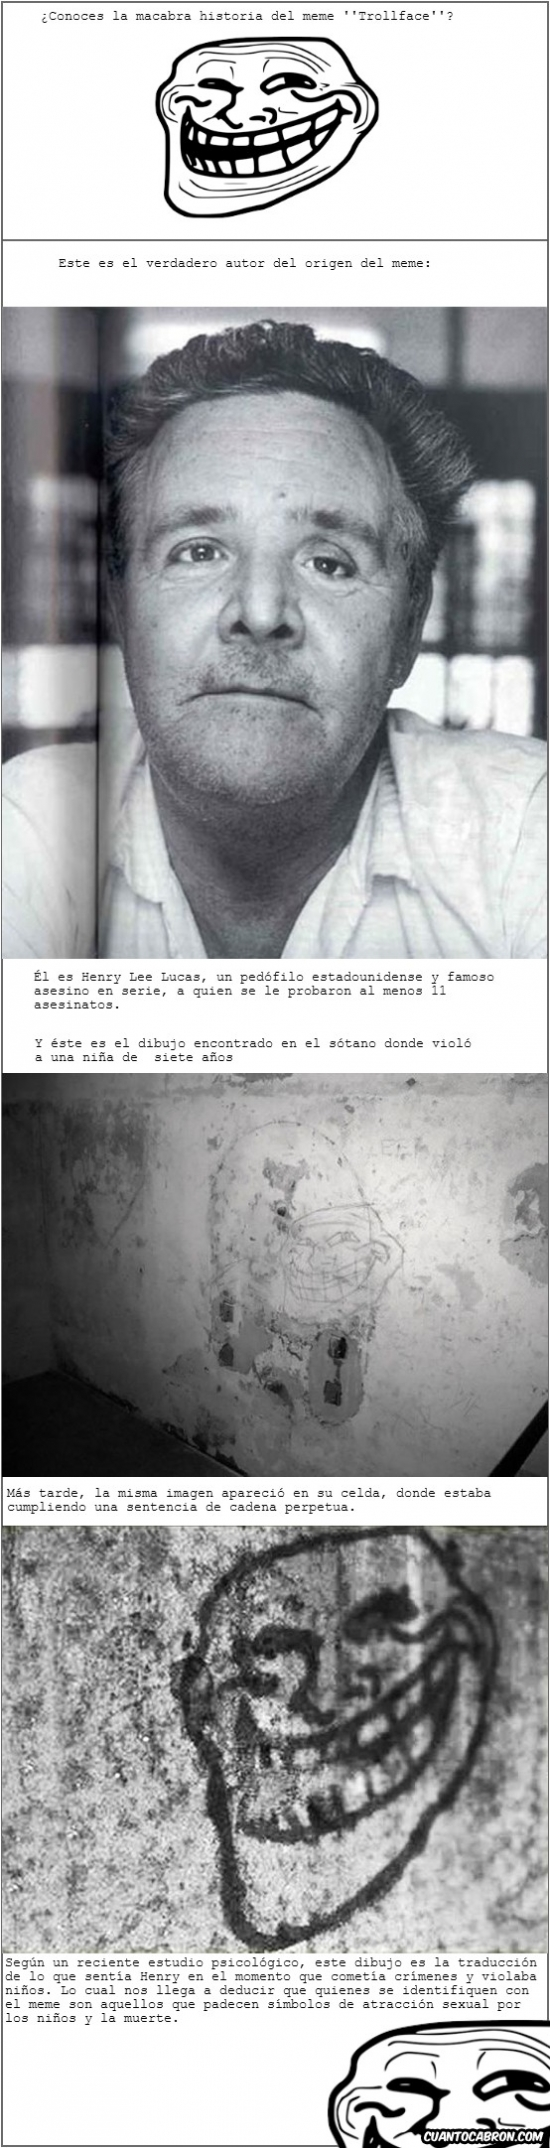 carcel,dibujo,henry lee lucas,historia,macabra,origen,pared,sotano,trollface,violador